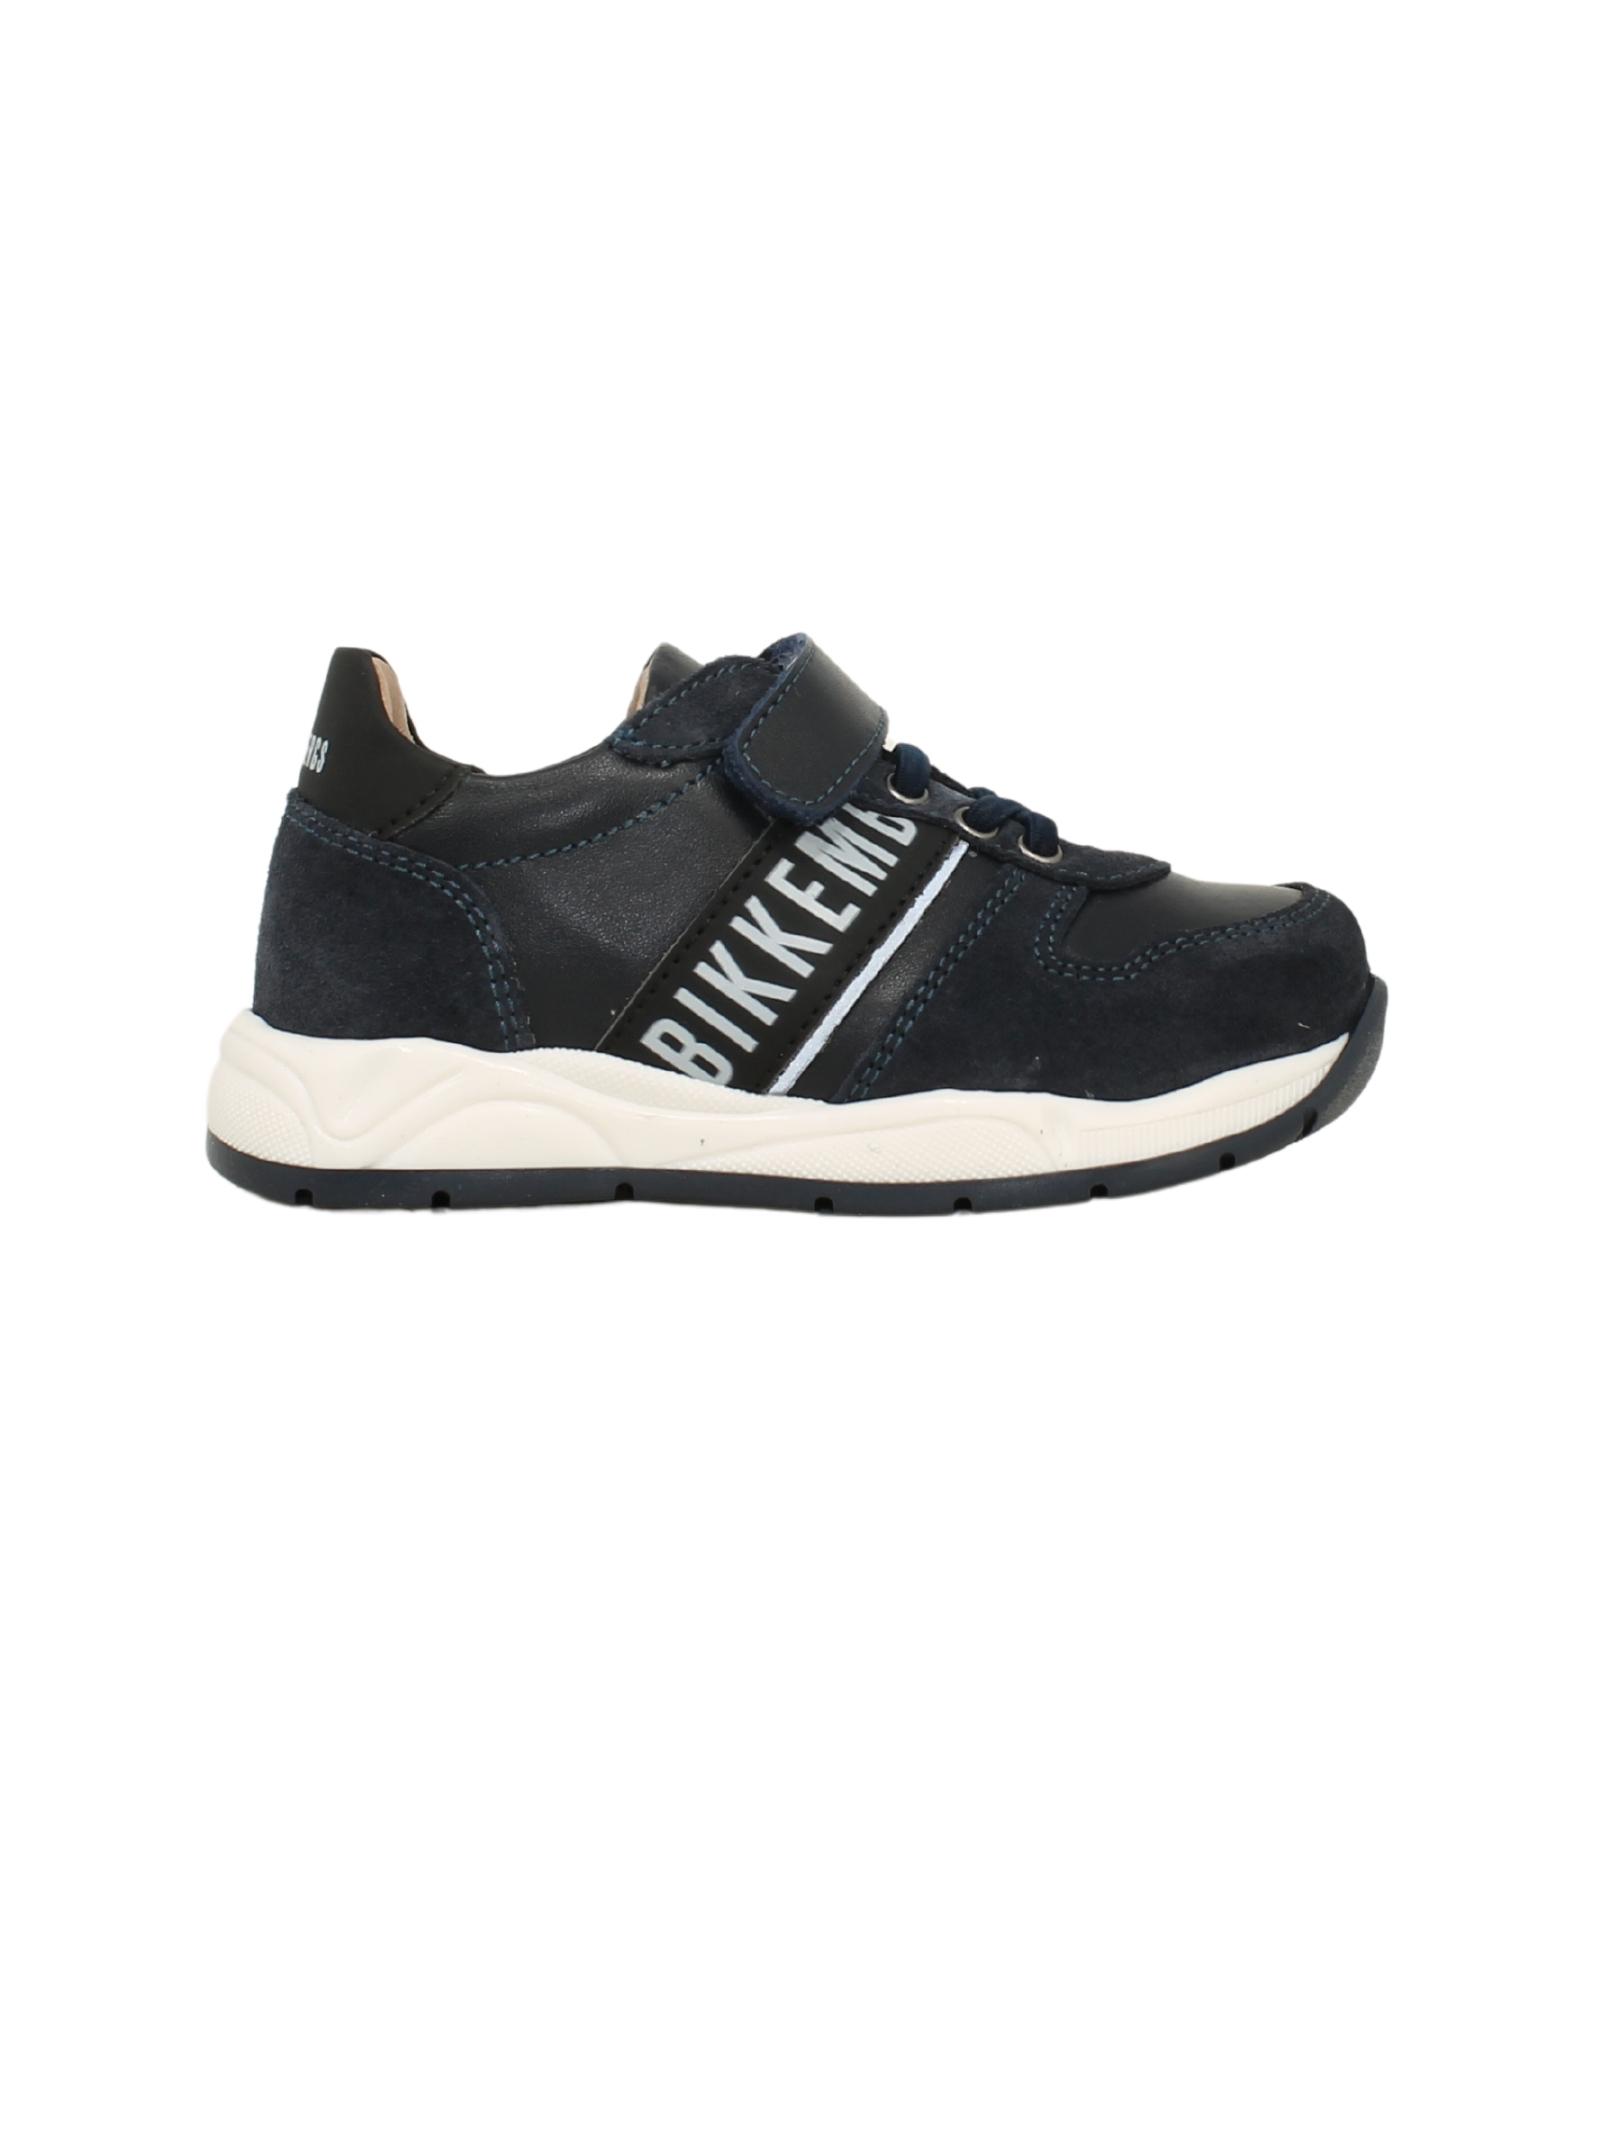 Baby Logo Low Sneakers BIKKEMBERGS KIDS | Sneakers | K1B4207490128800BLU